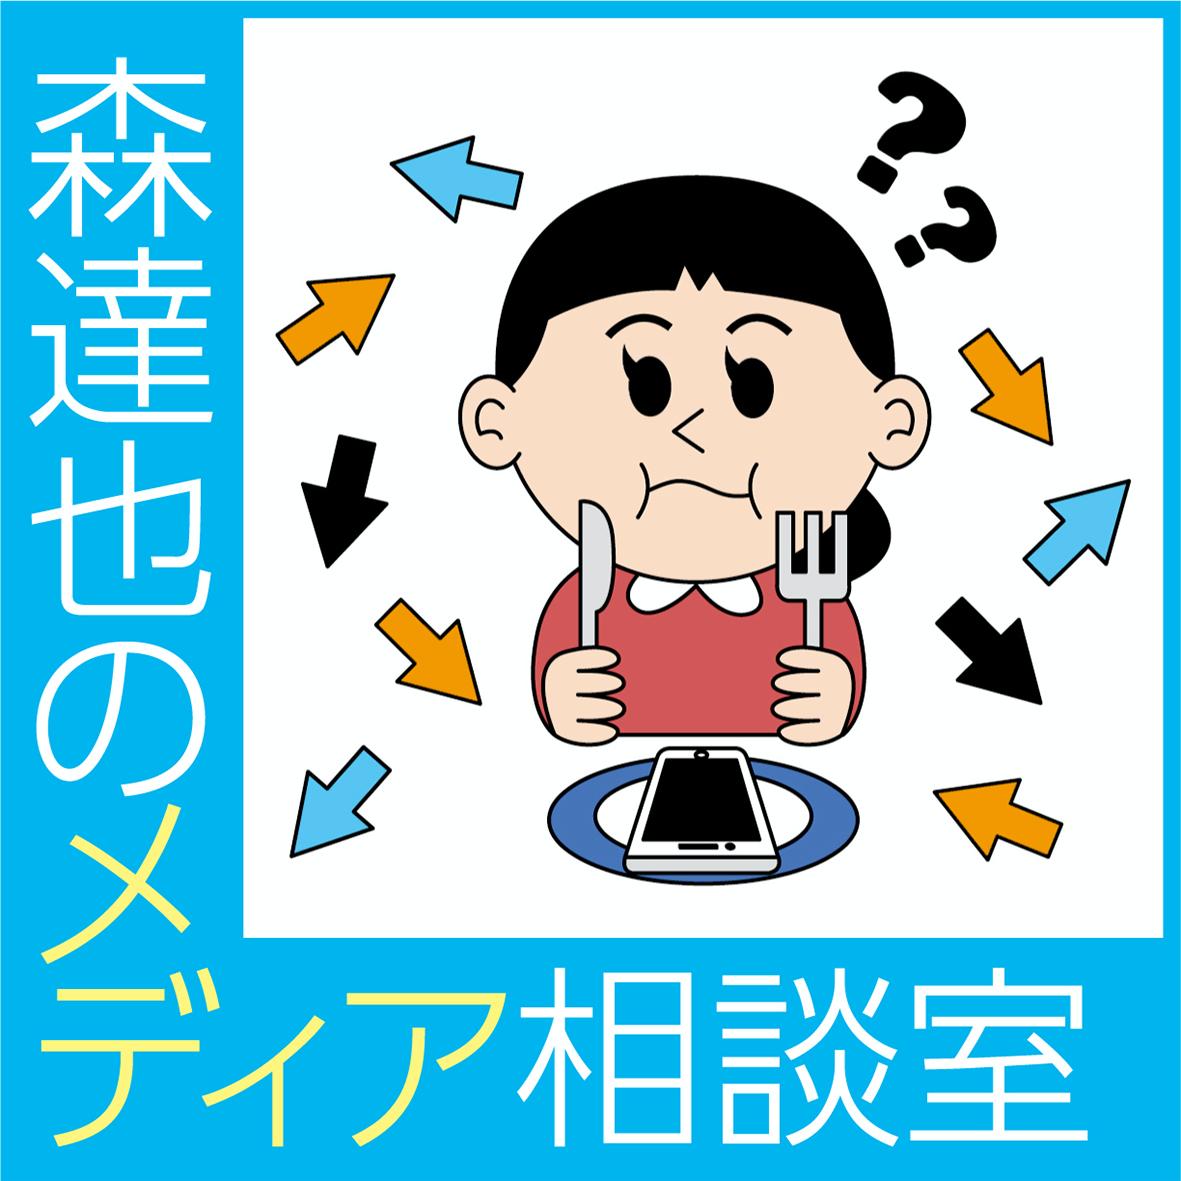 #25 NHKに出演された際に、番組側の意図的な編集はあったのでしょうか?